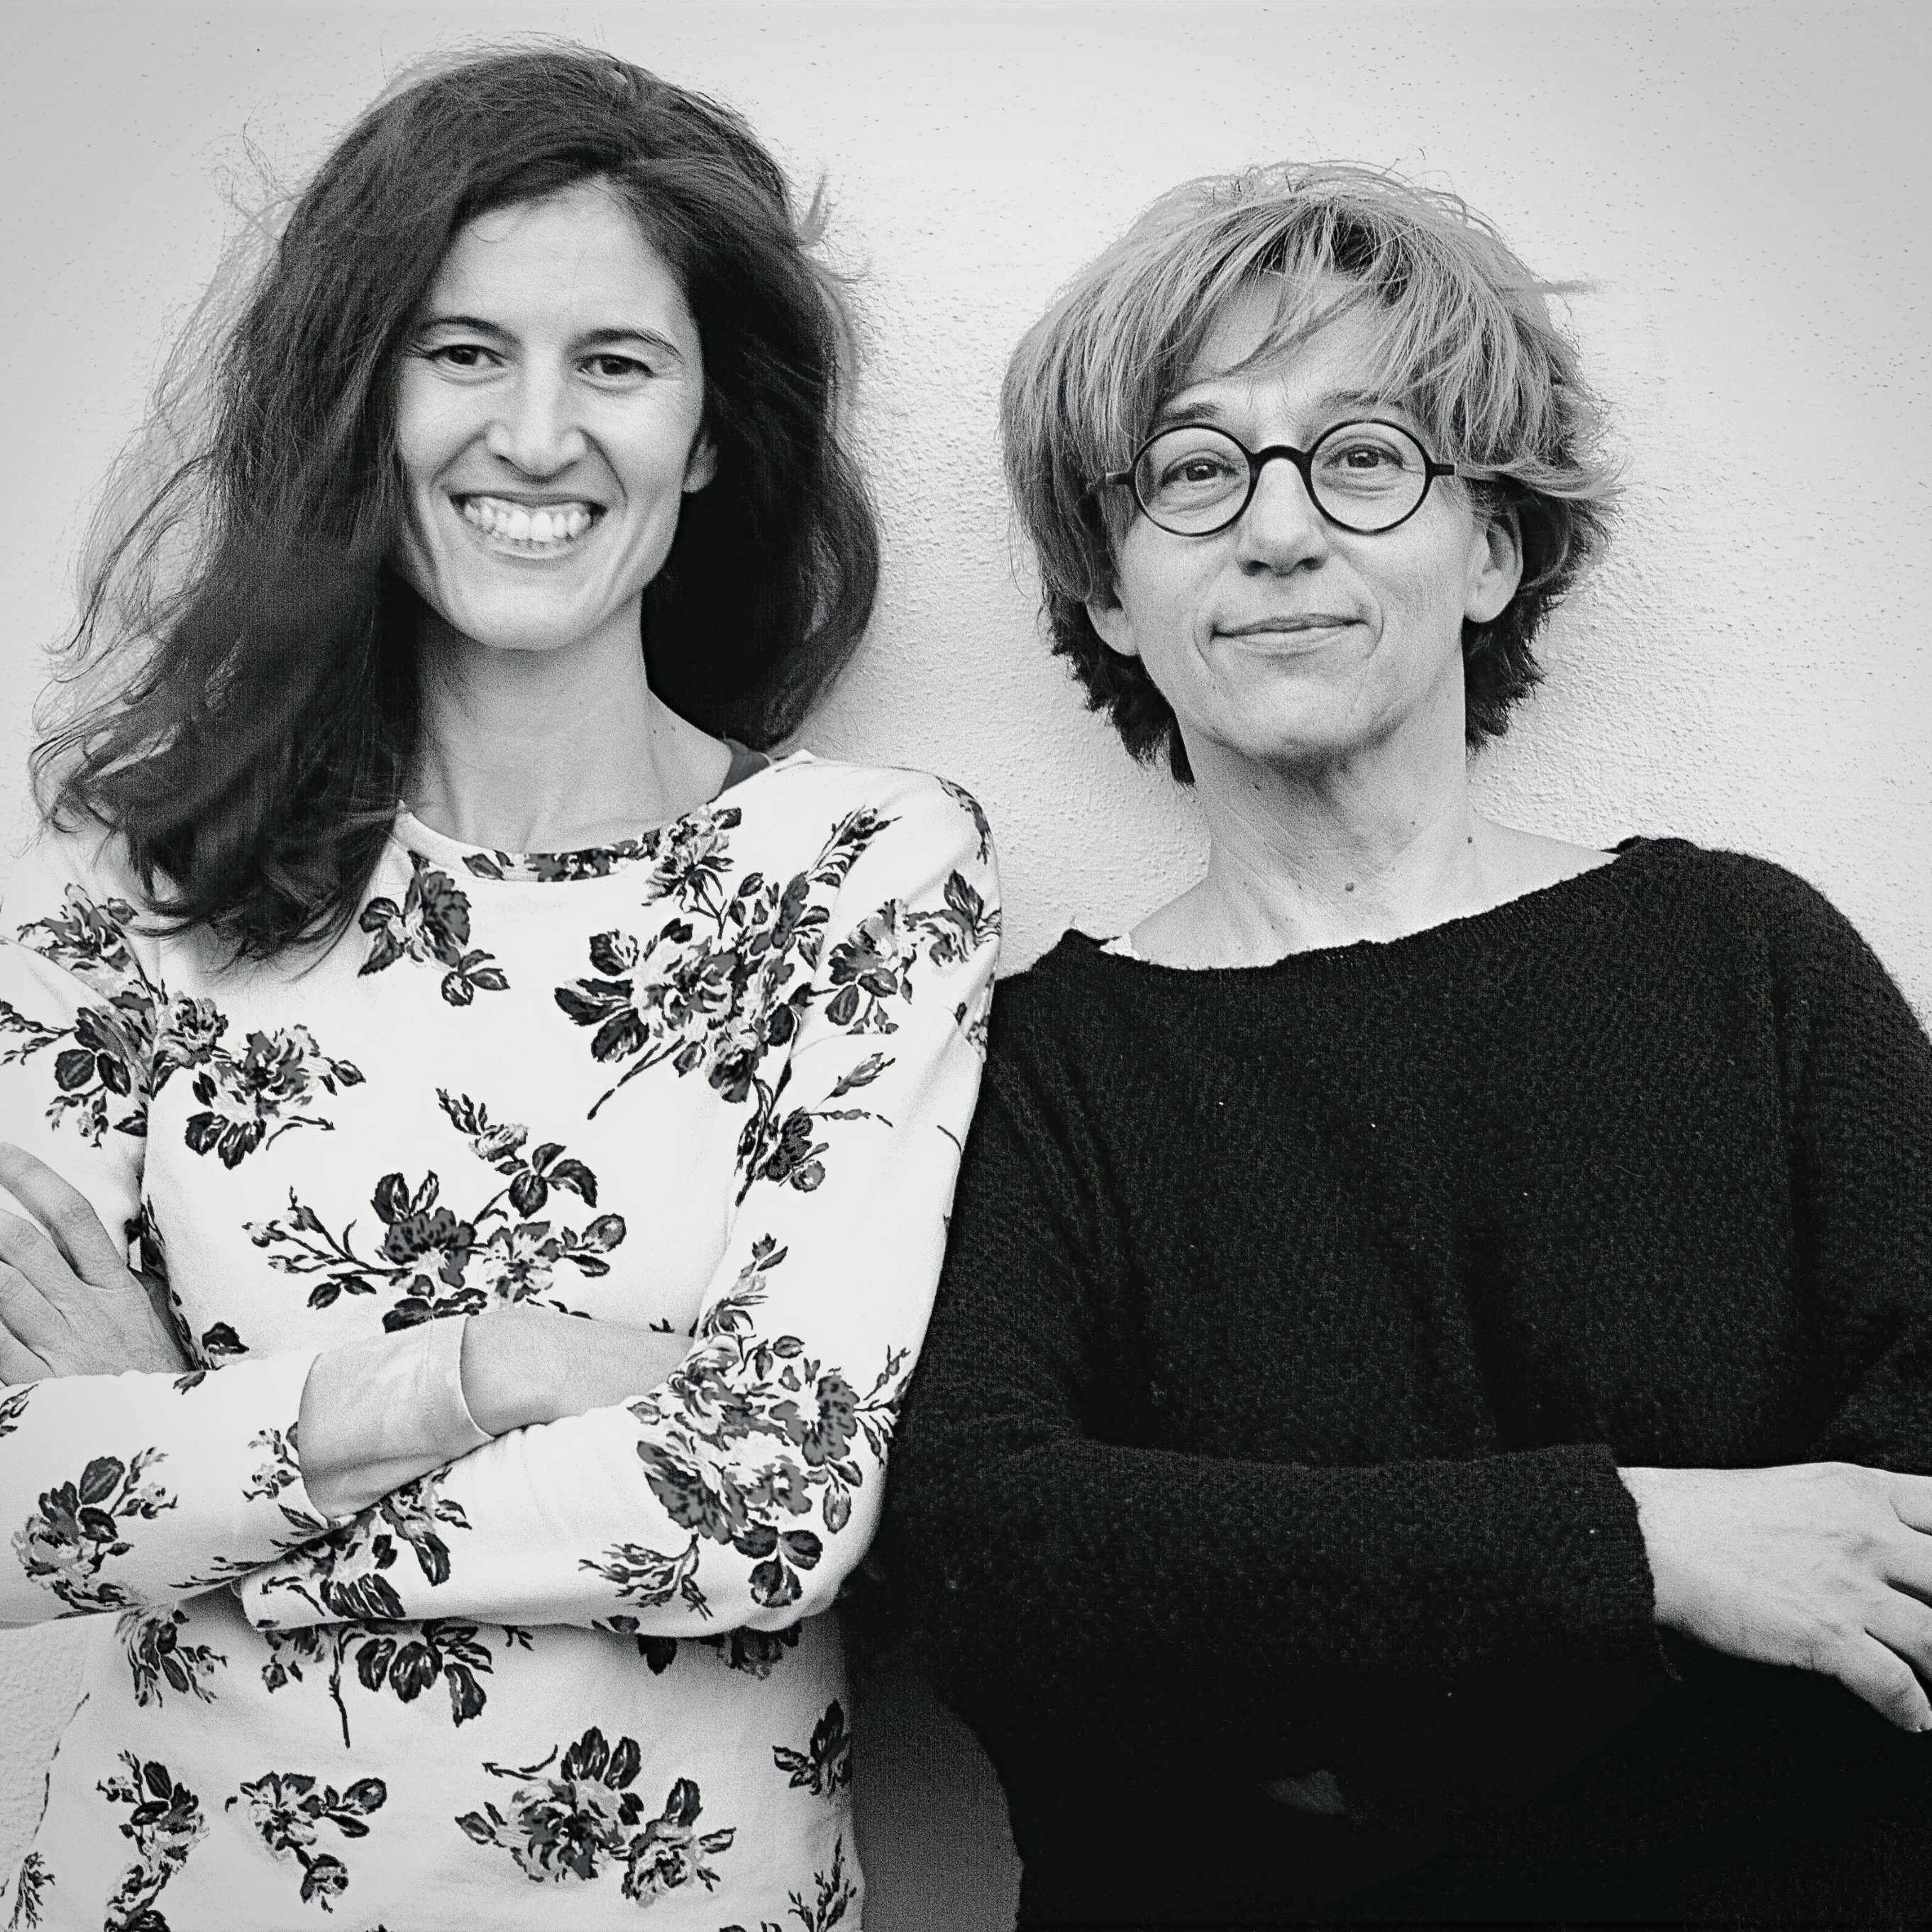 Ana Haro & Mariona Fernández